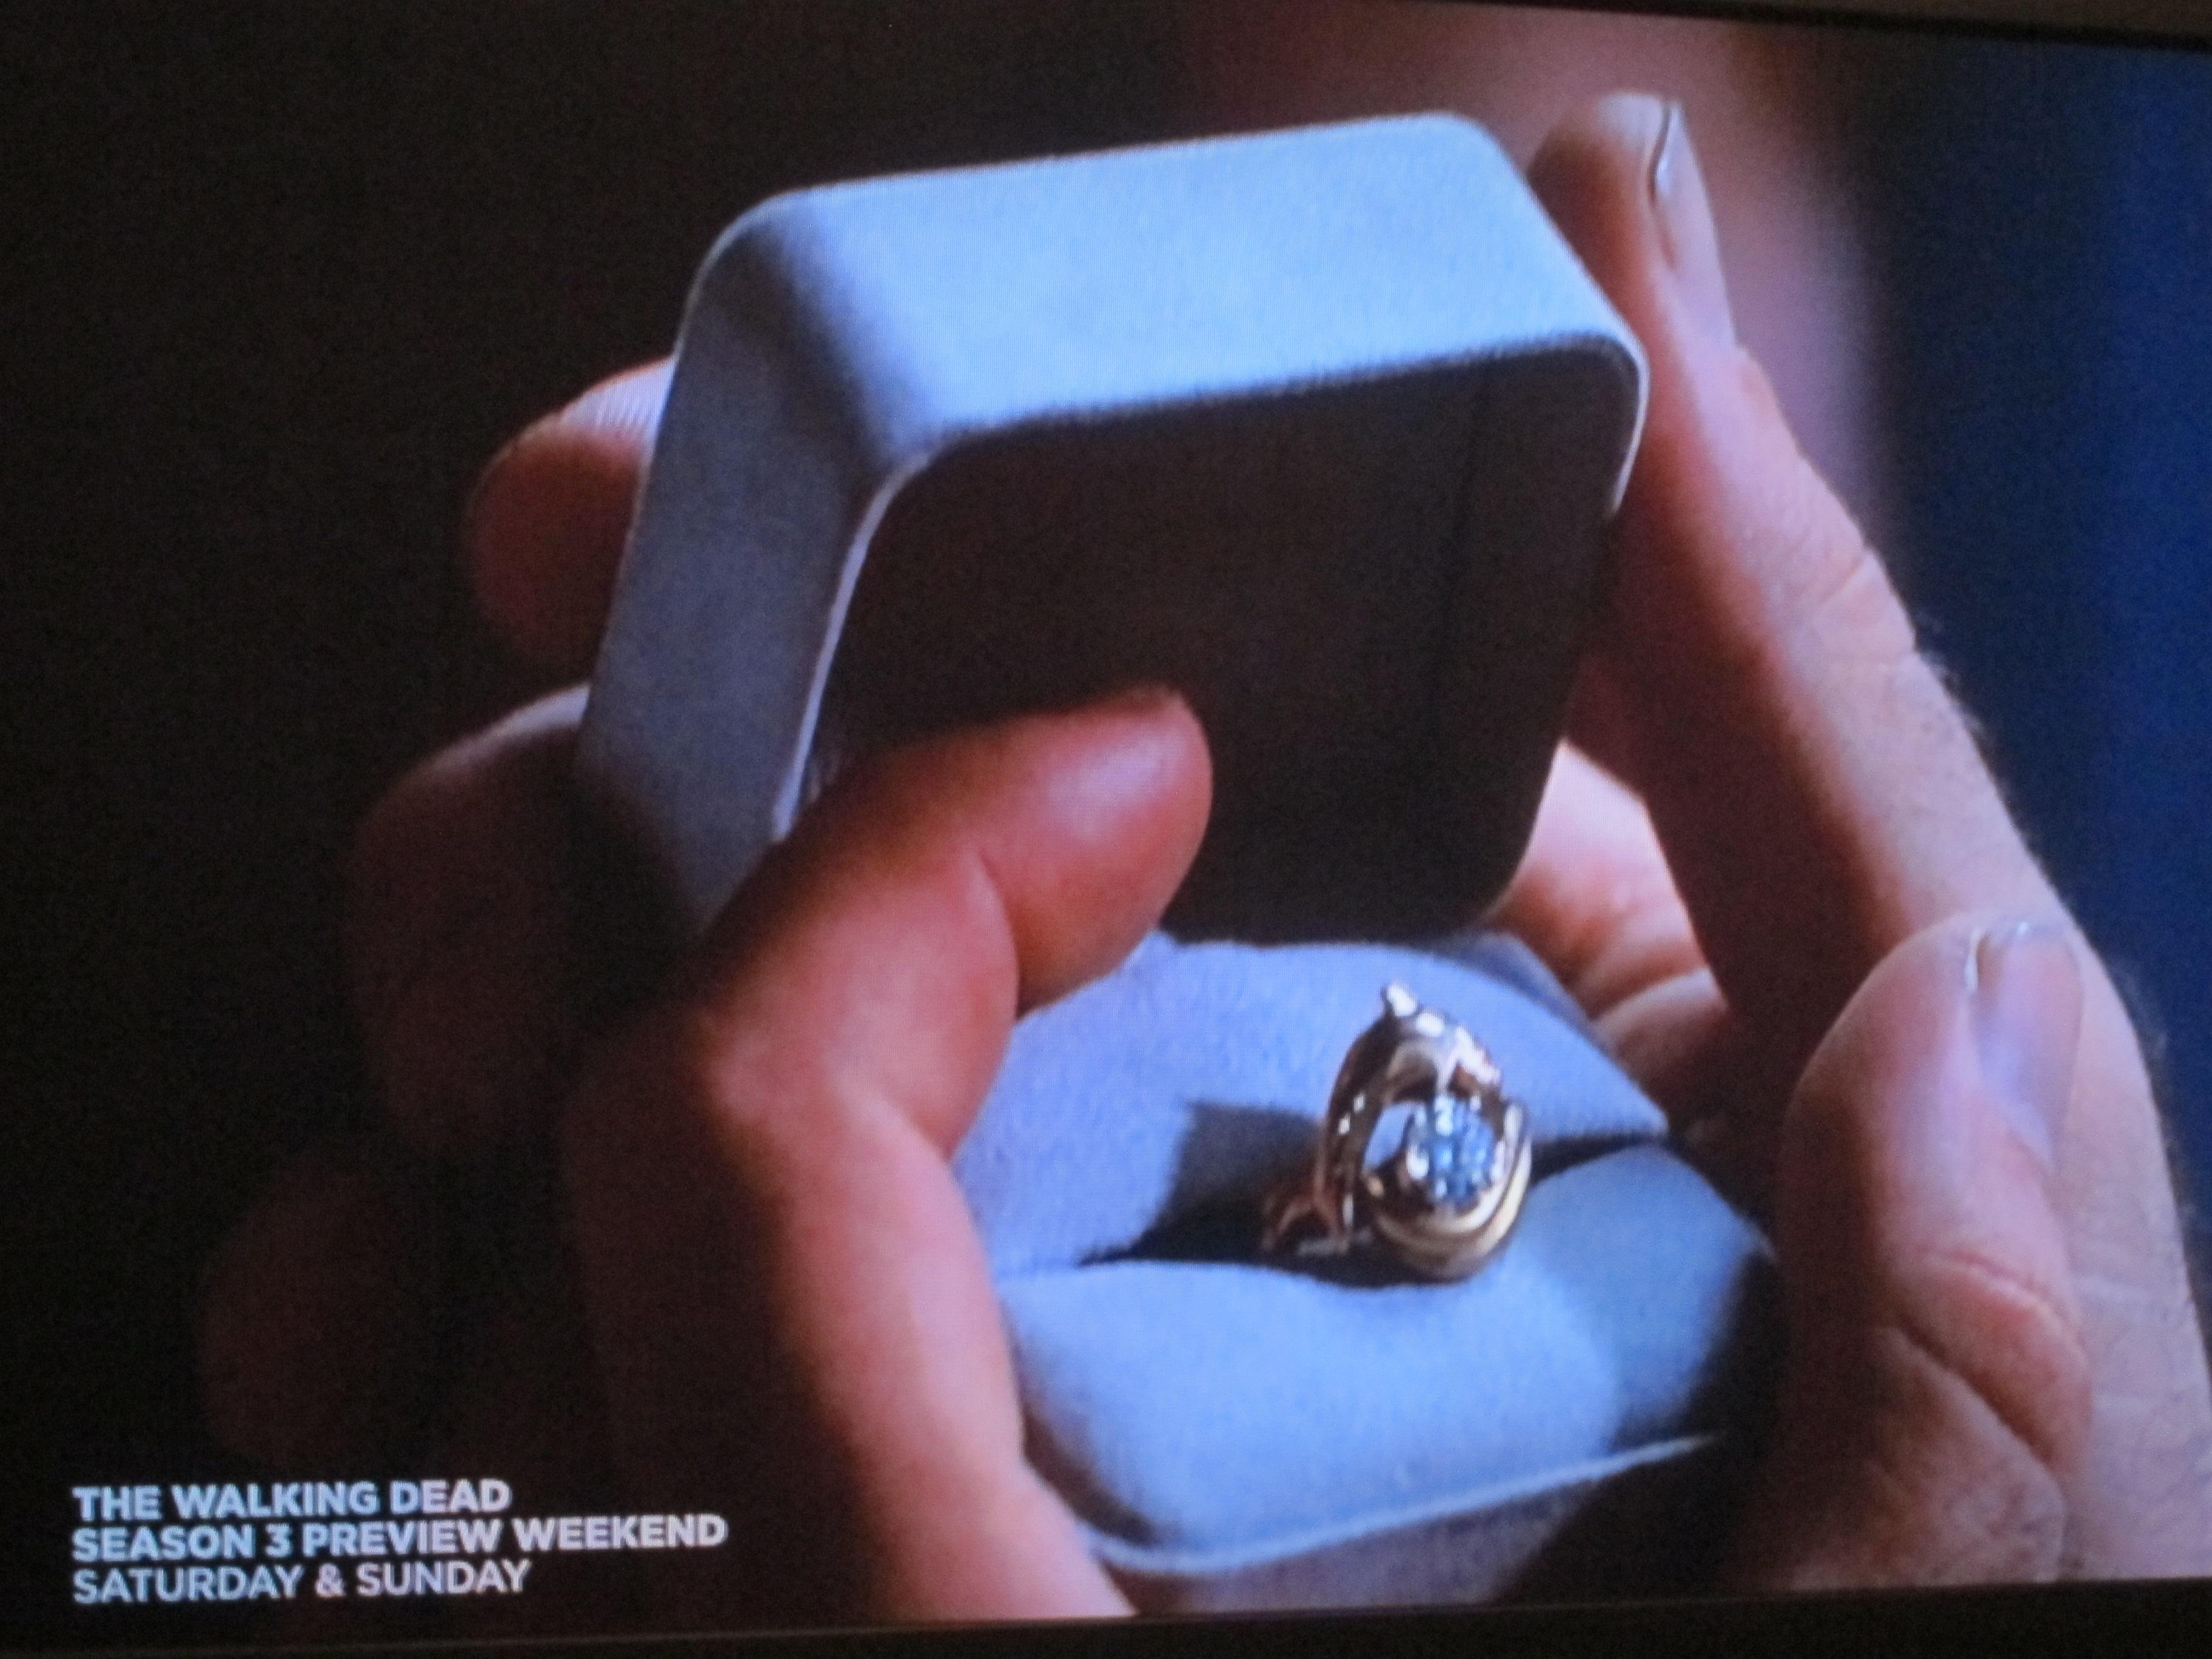 dolphin wedding ring sets dolphin wedding rings Dolphin wedding ring sets A